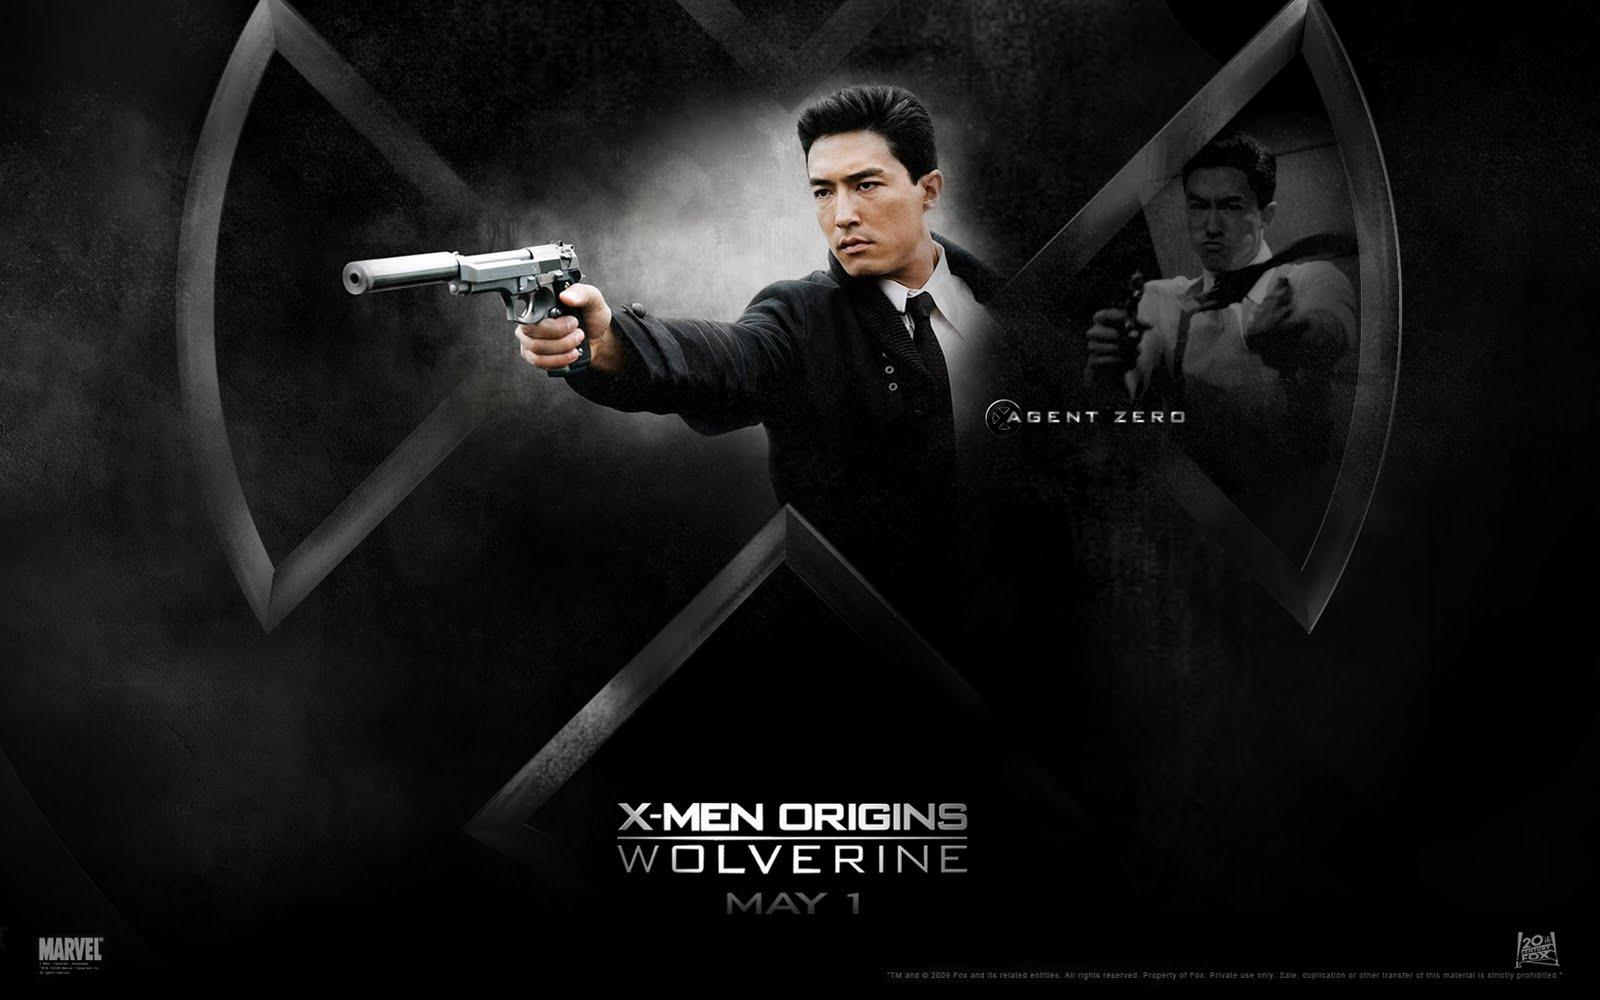 http://3.bp.blogspot.com/_nD_YgZuOadA/TI2w3ysoCXI/AAAAAAAAAjQ/x8Wg6gYxg10/s1600/wolverine_1680_Agent_Zero.jpg